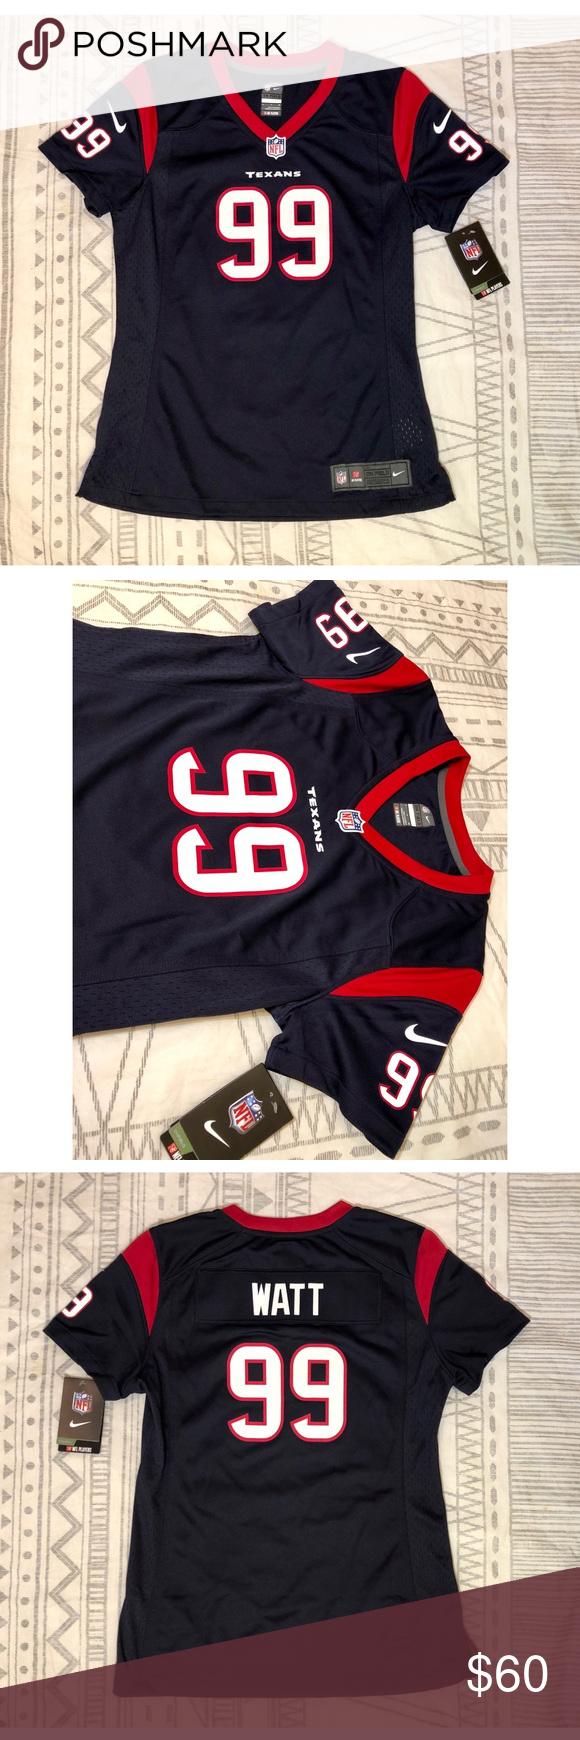 17755cff5 Houston Texans JJ Watt 99 NFL Navy blue Jersey NWT BRAND NEW WITH TAGS! Women's  Houston Texans JJ Watt Nike Navy Blue Game Jersey Nike Tops